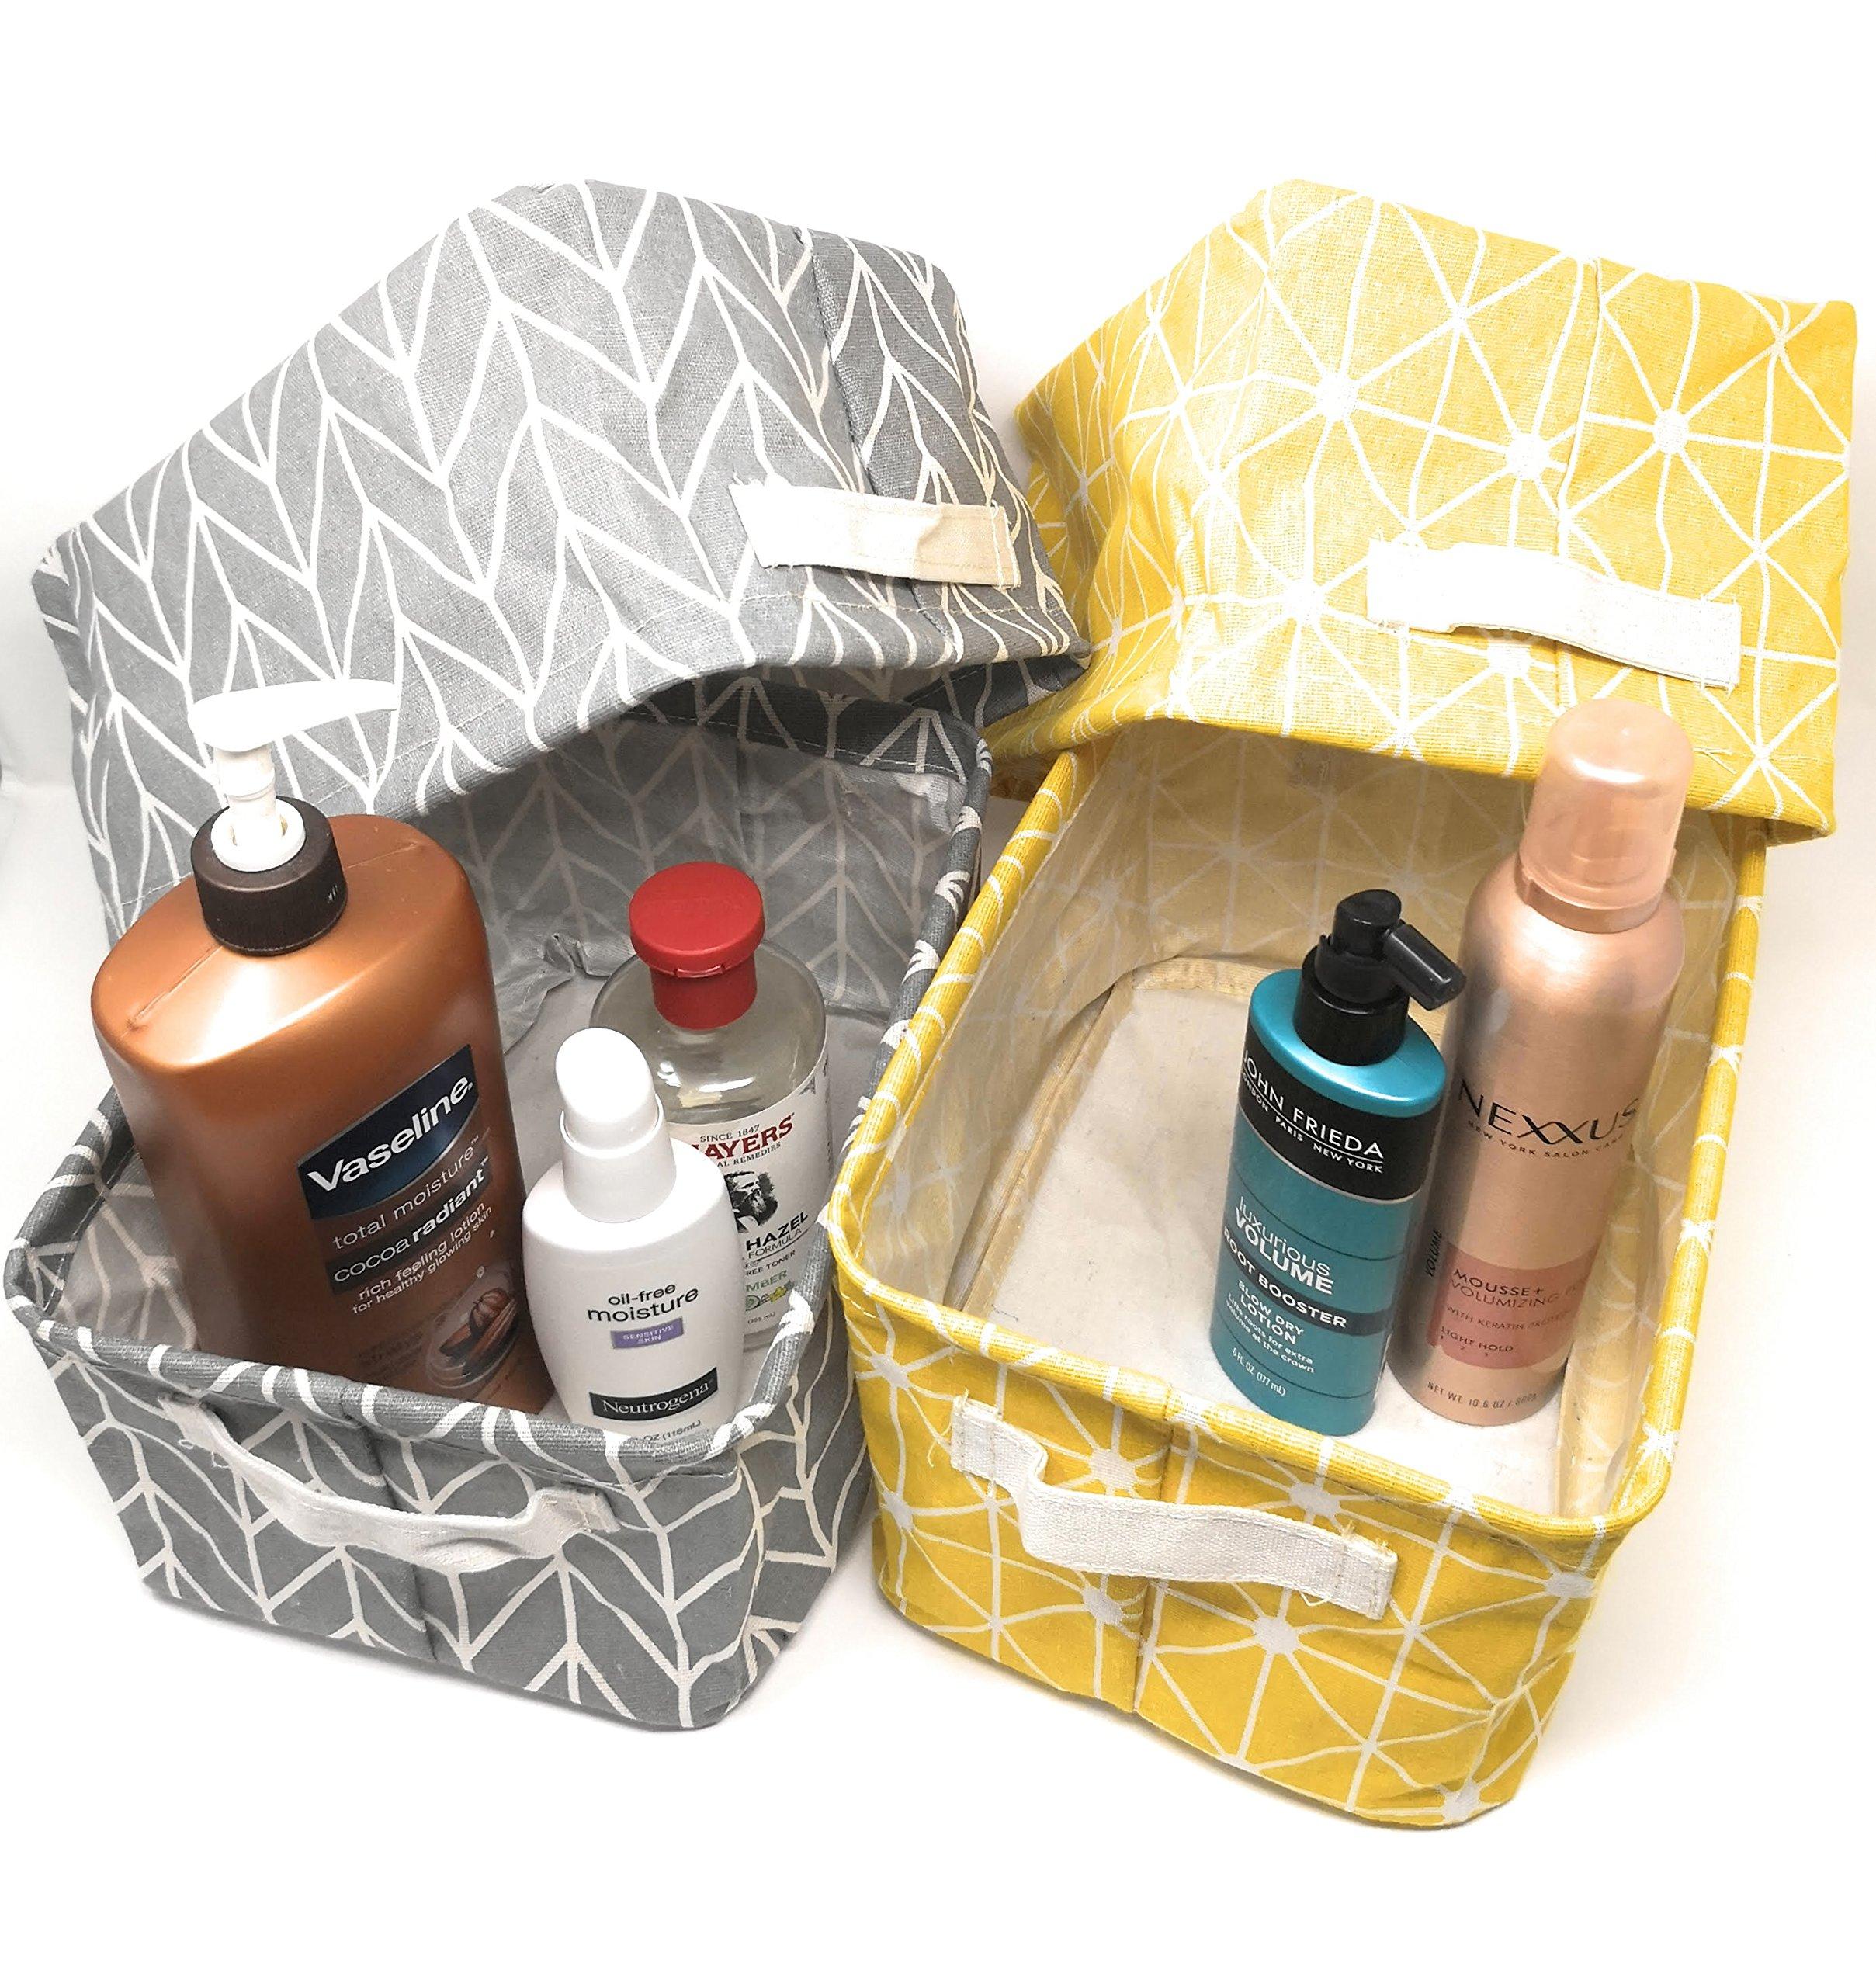 ECOHIP 4-Pack Small Storage Bins Fabric Desk Organizer Baskets Closet Drawer Divider Grey